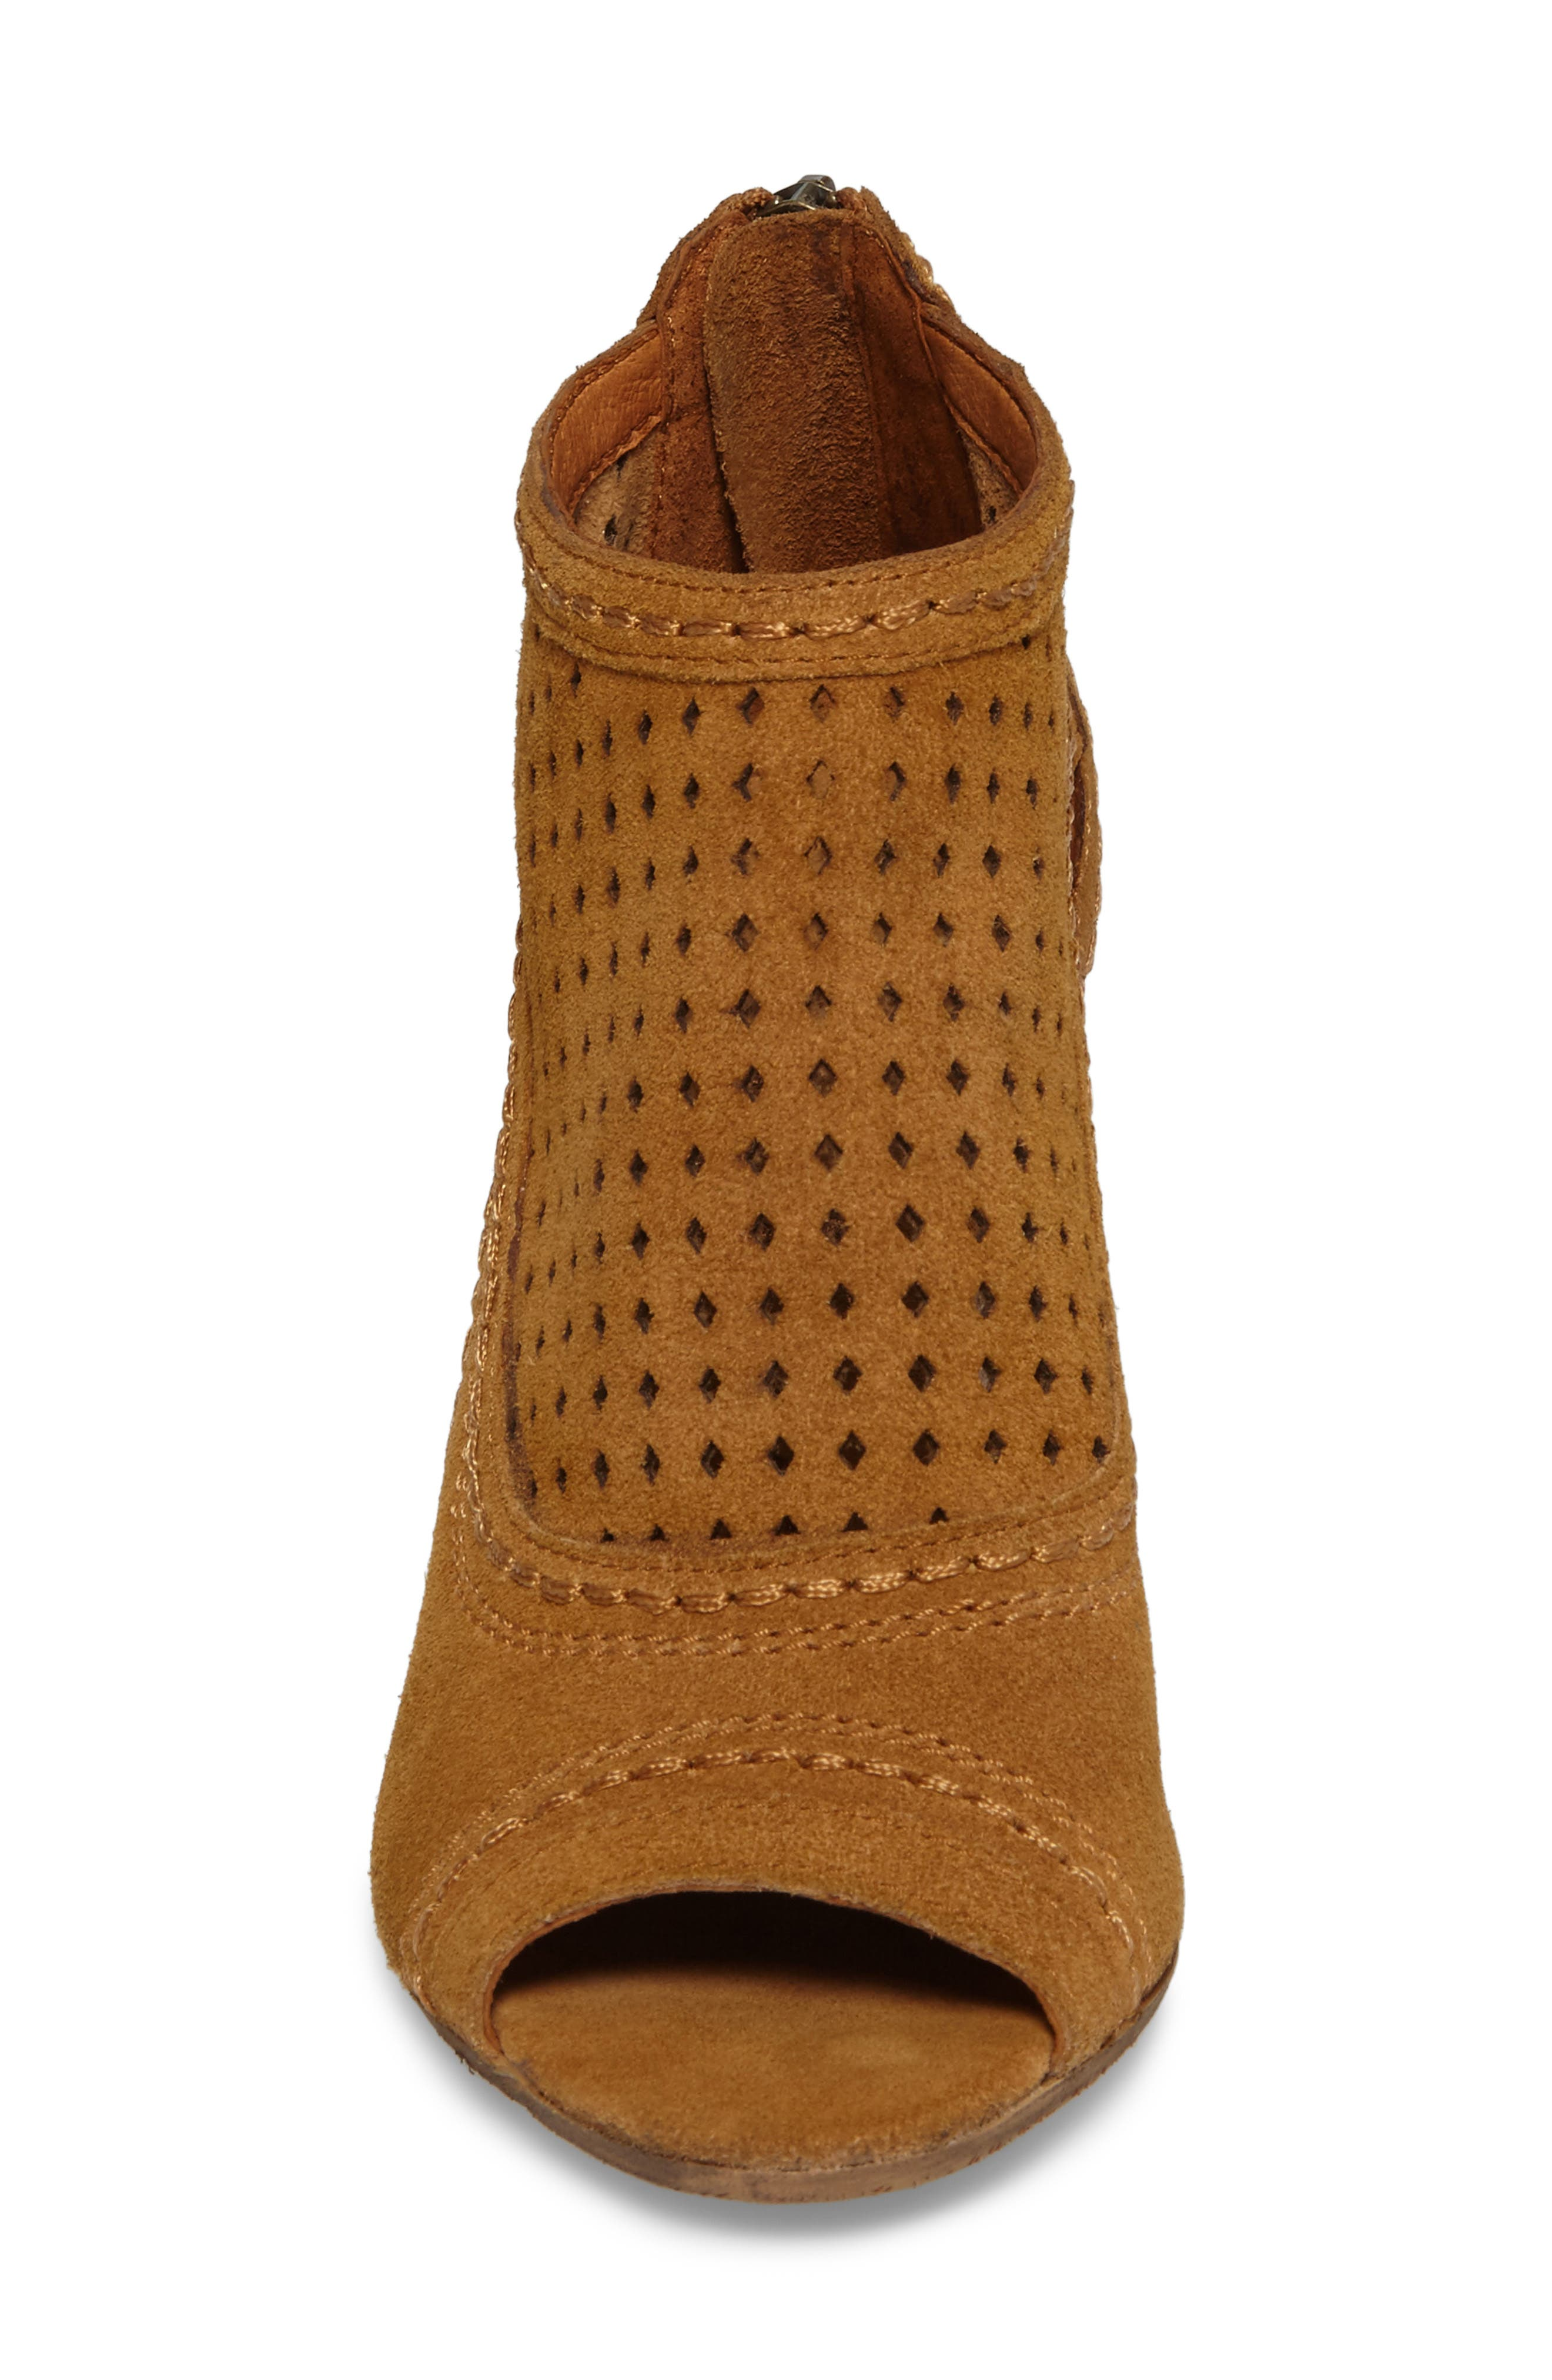 Sharon Perforated Wedge Sandal,                             Alternate thumbnail 4, color,                             249